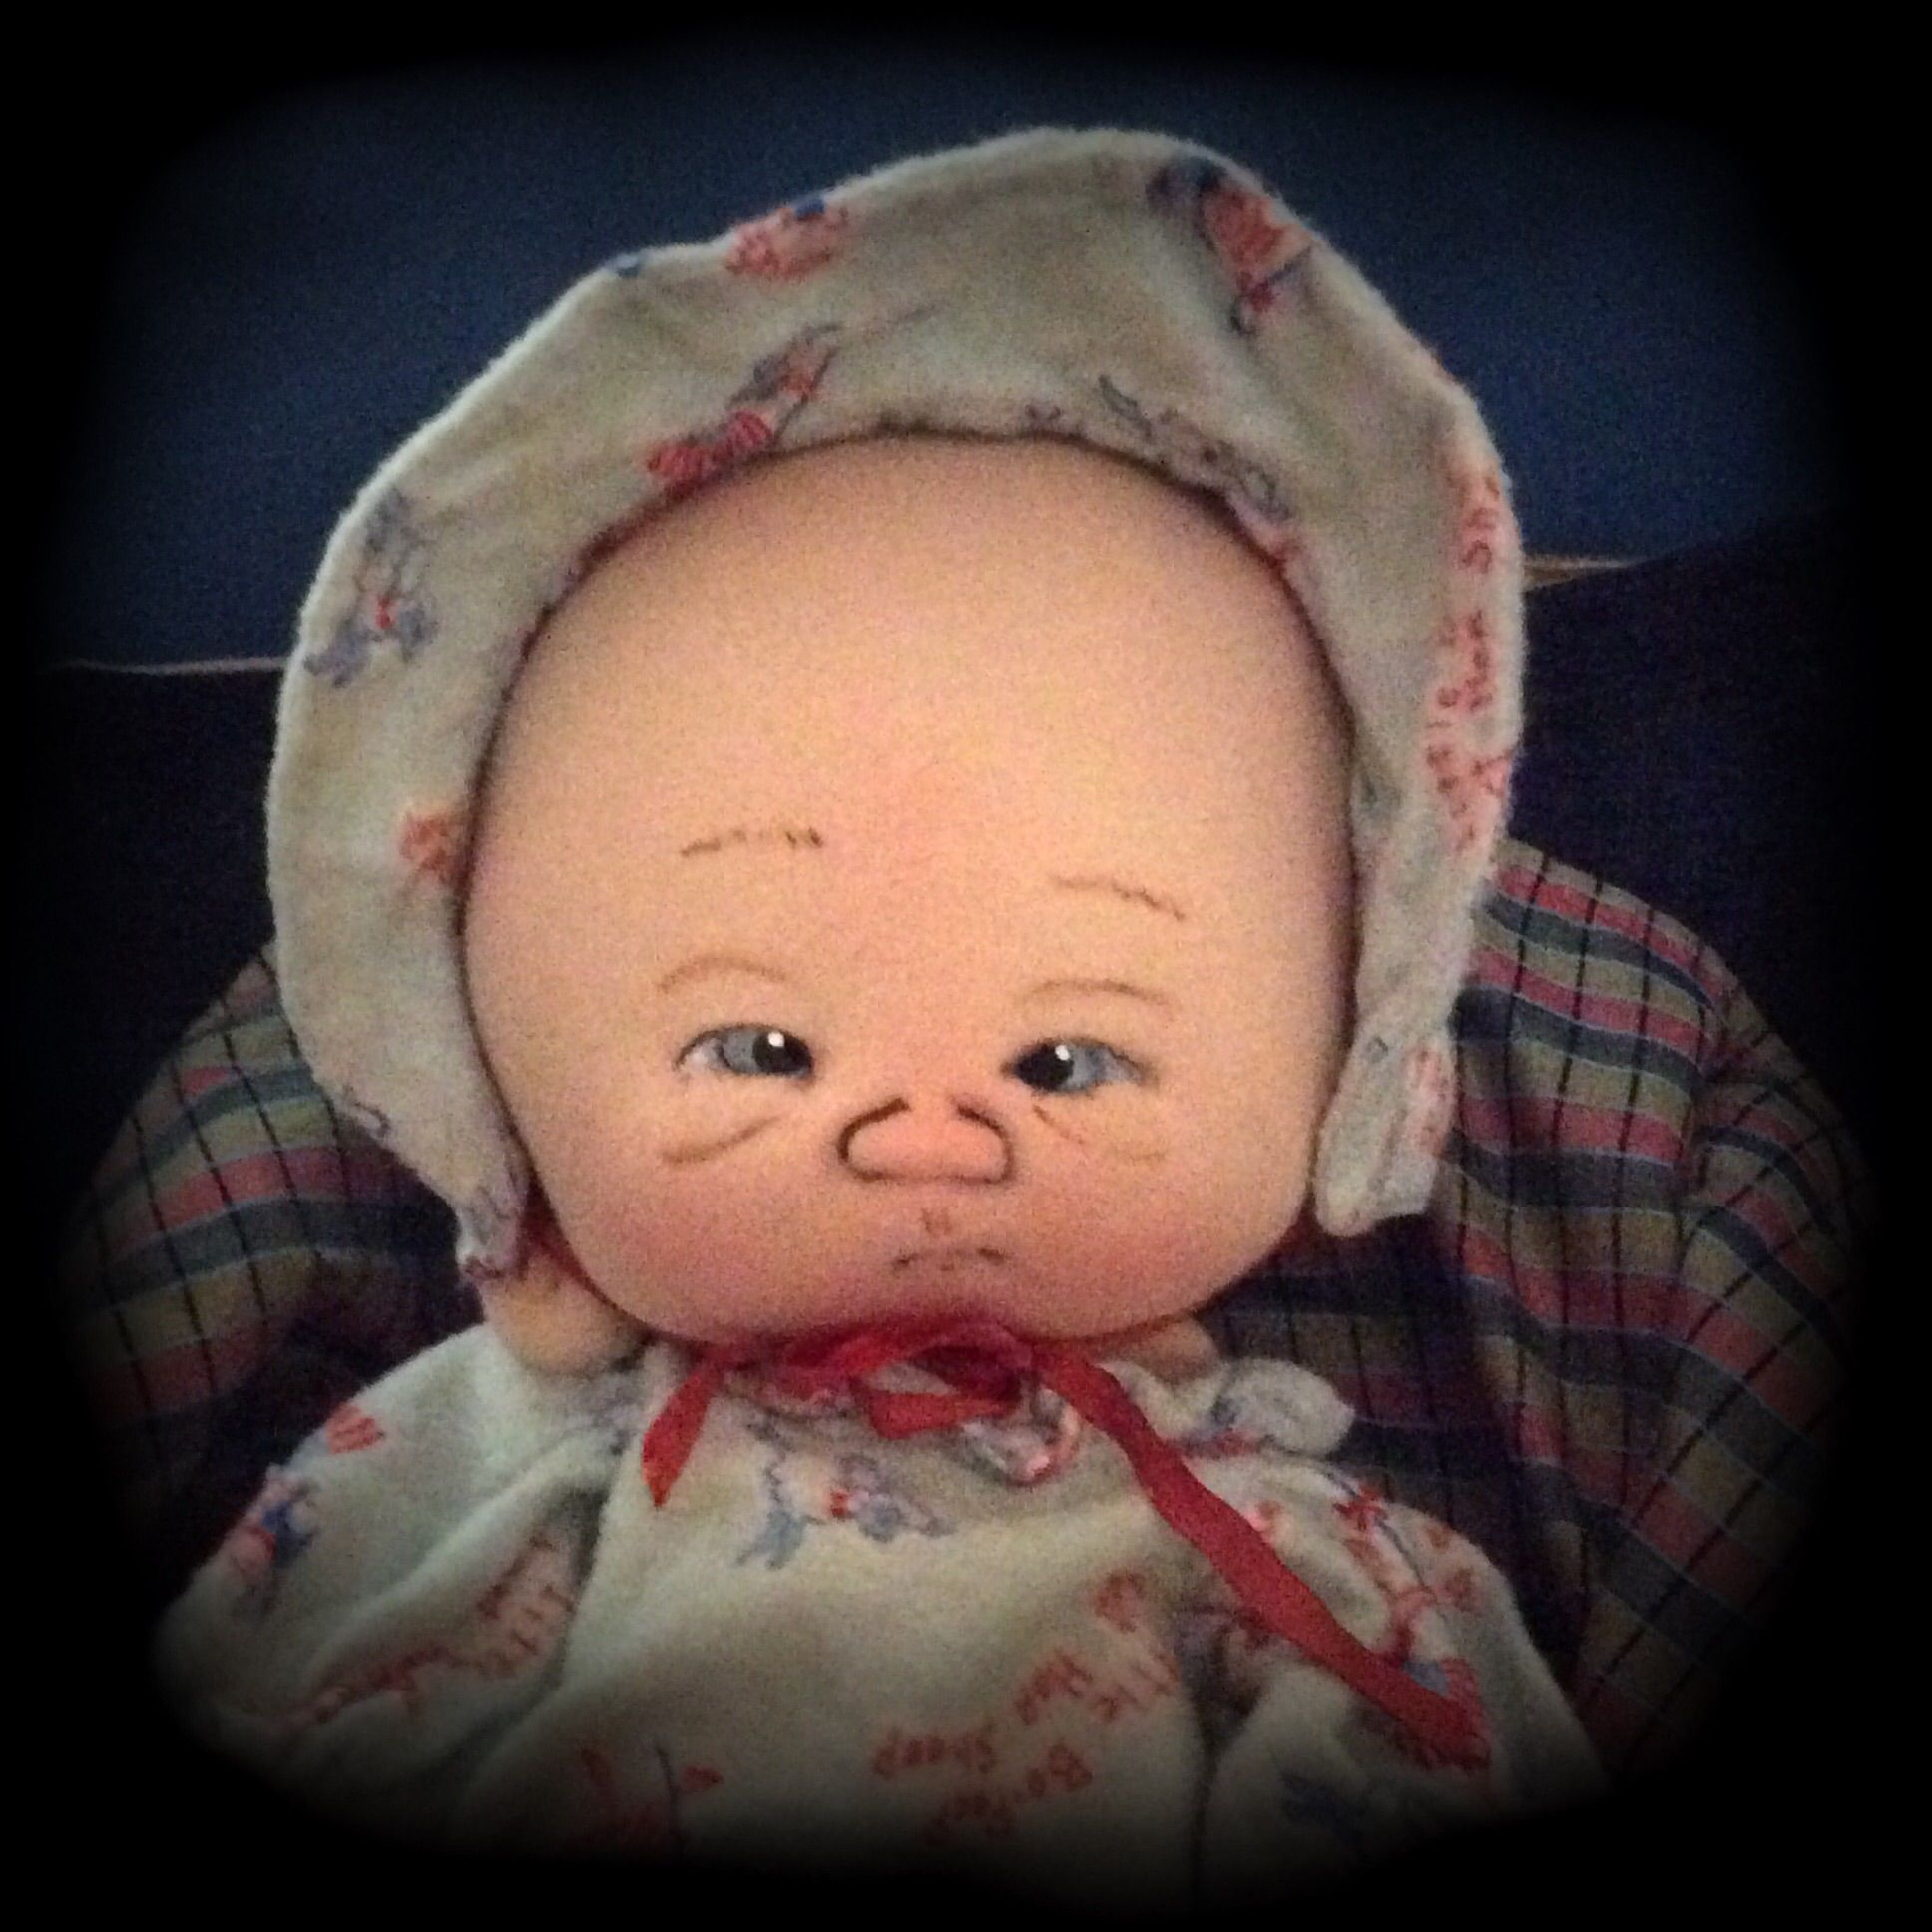 Preemie Little Bo Peep one of a kind by doll artist  Jan Shackelford